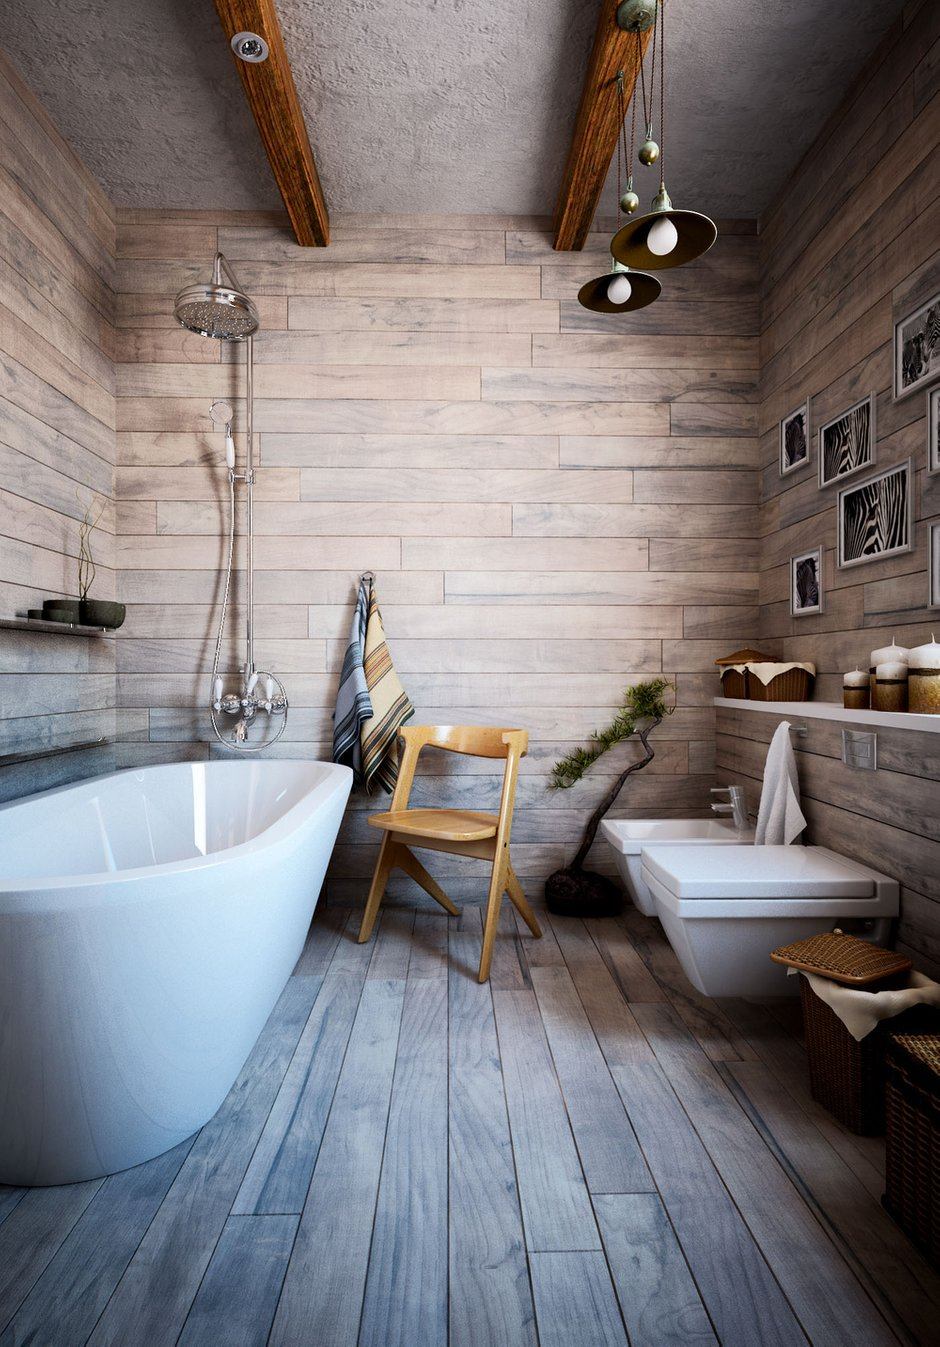 Фотография: Ванная в стиле Скандинавский, Квартира, Дом, Дома и квартиры, Проект недели – фото на InMyRoom.ru